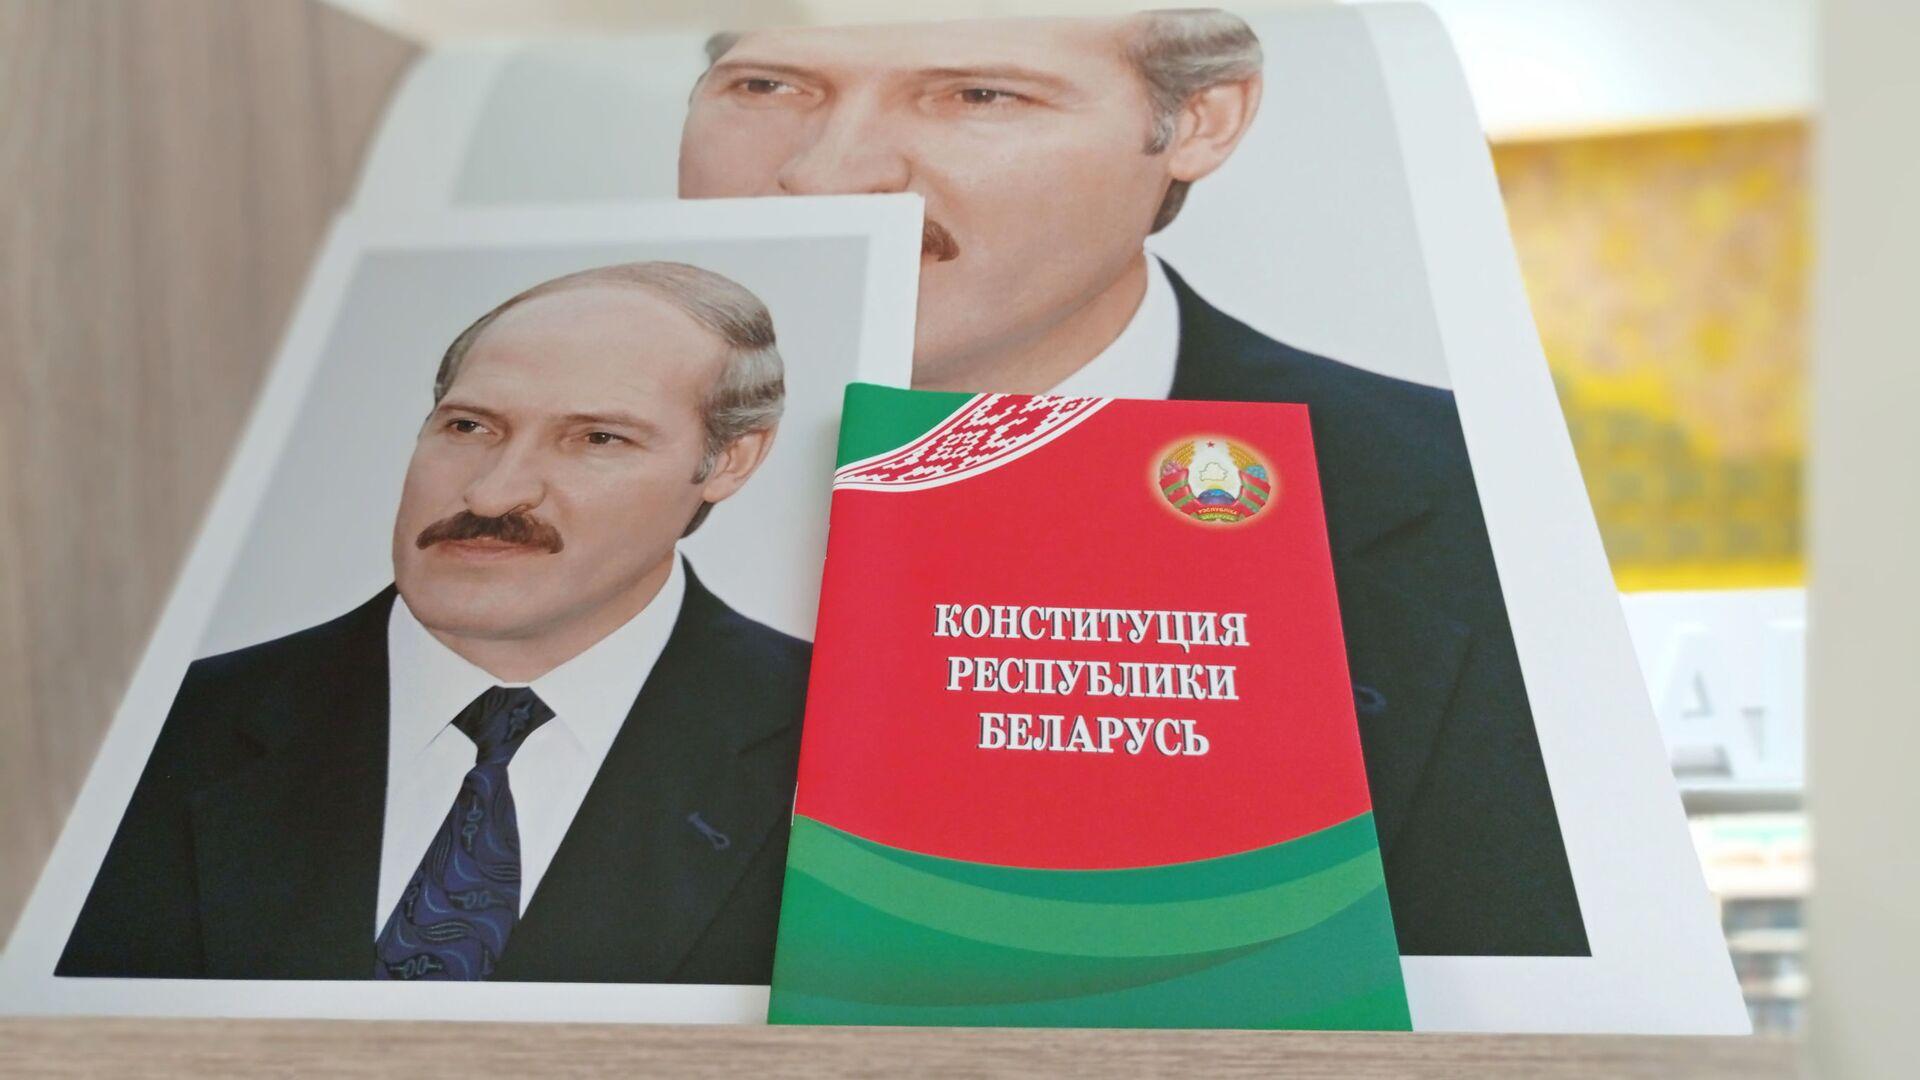 Конституция Республики Беларусь - Sputnik Беларусь, 1920, 28.09.2021